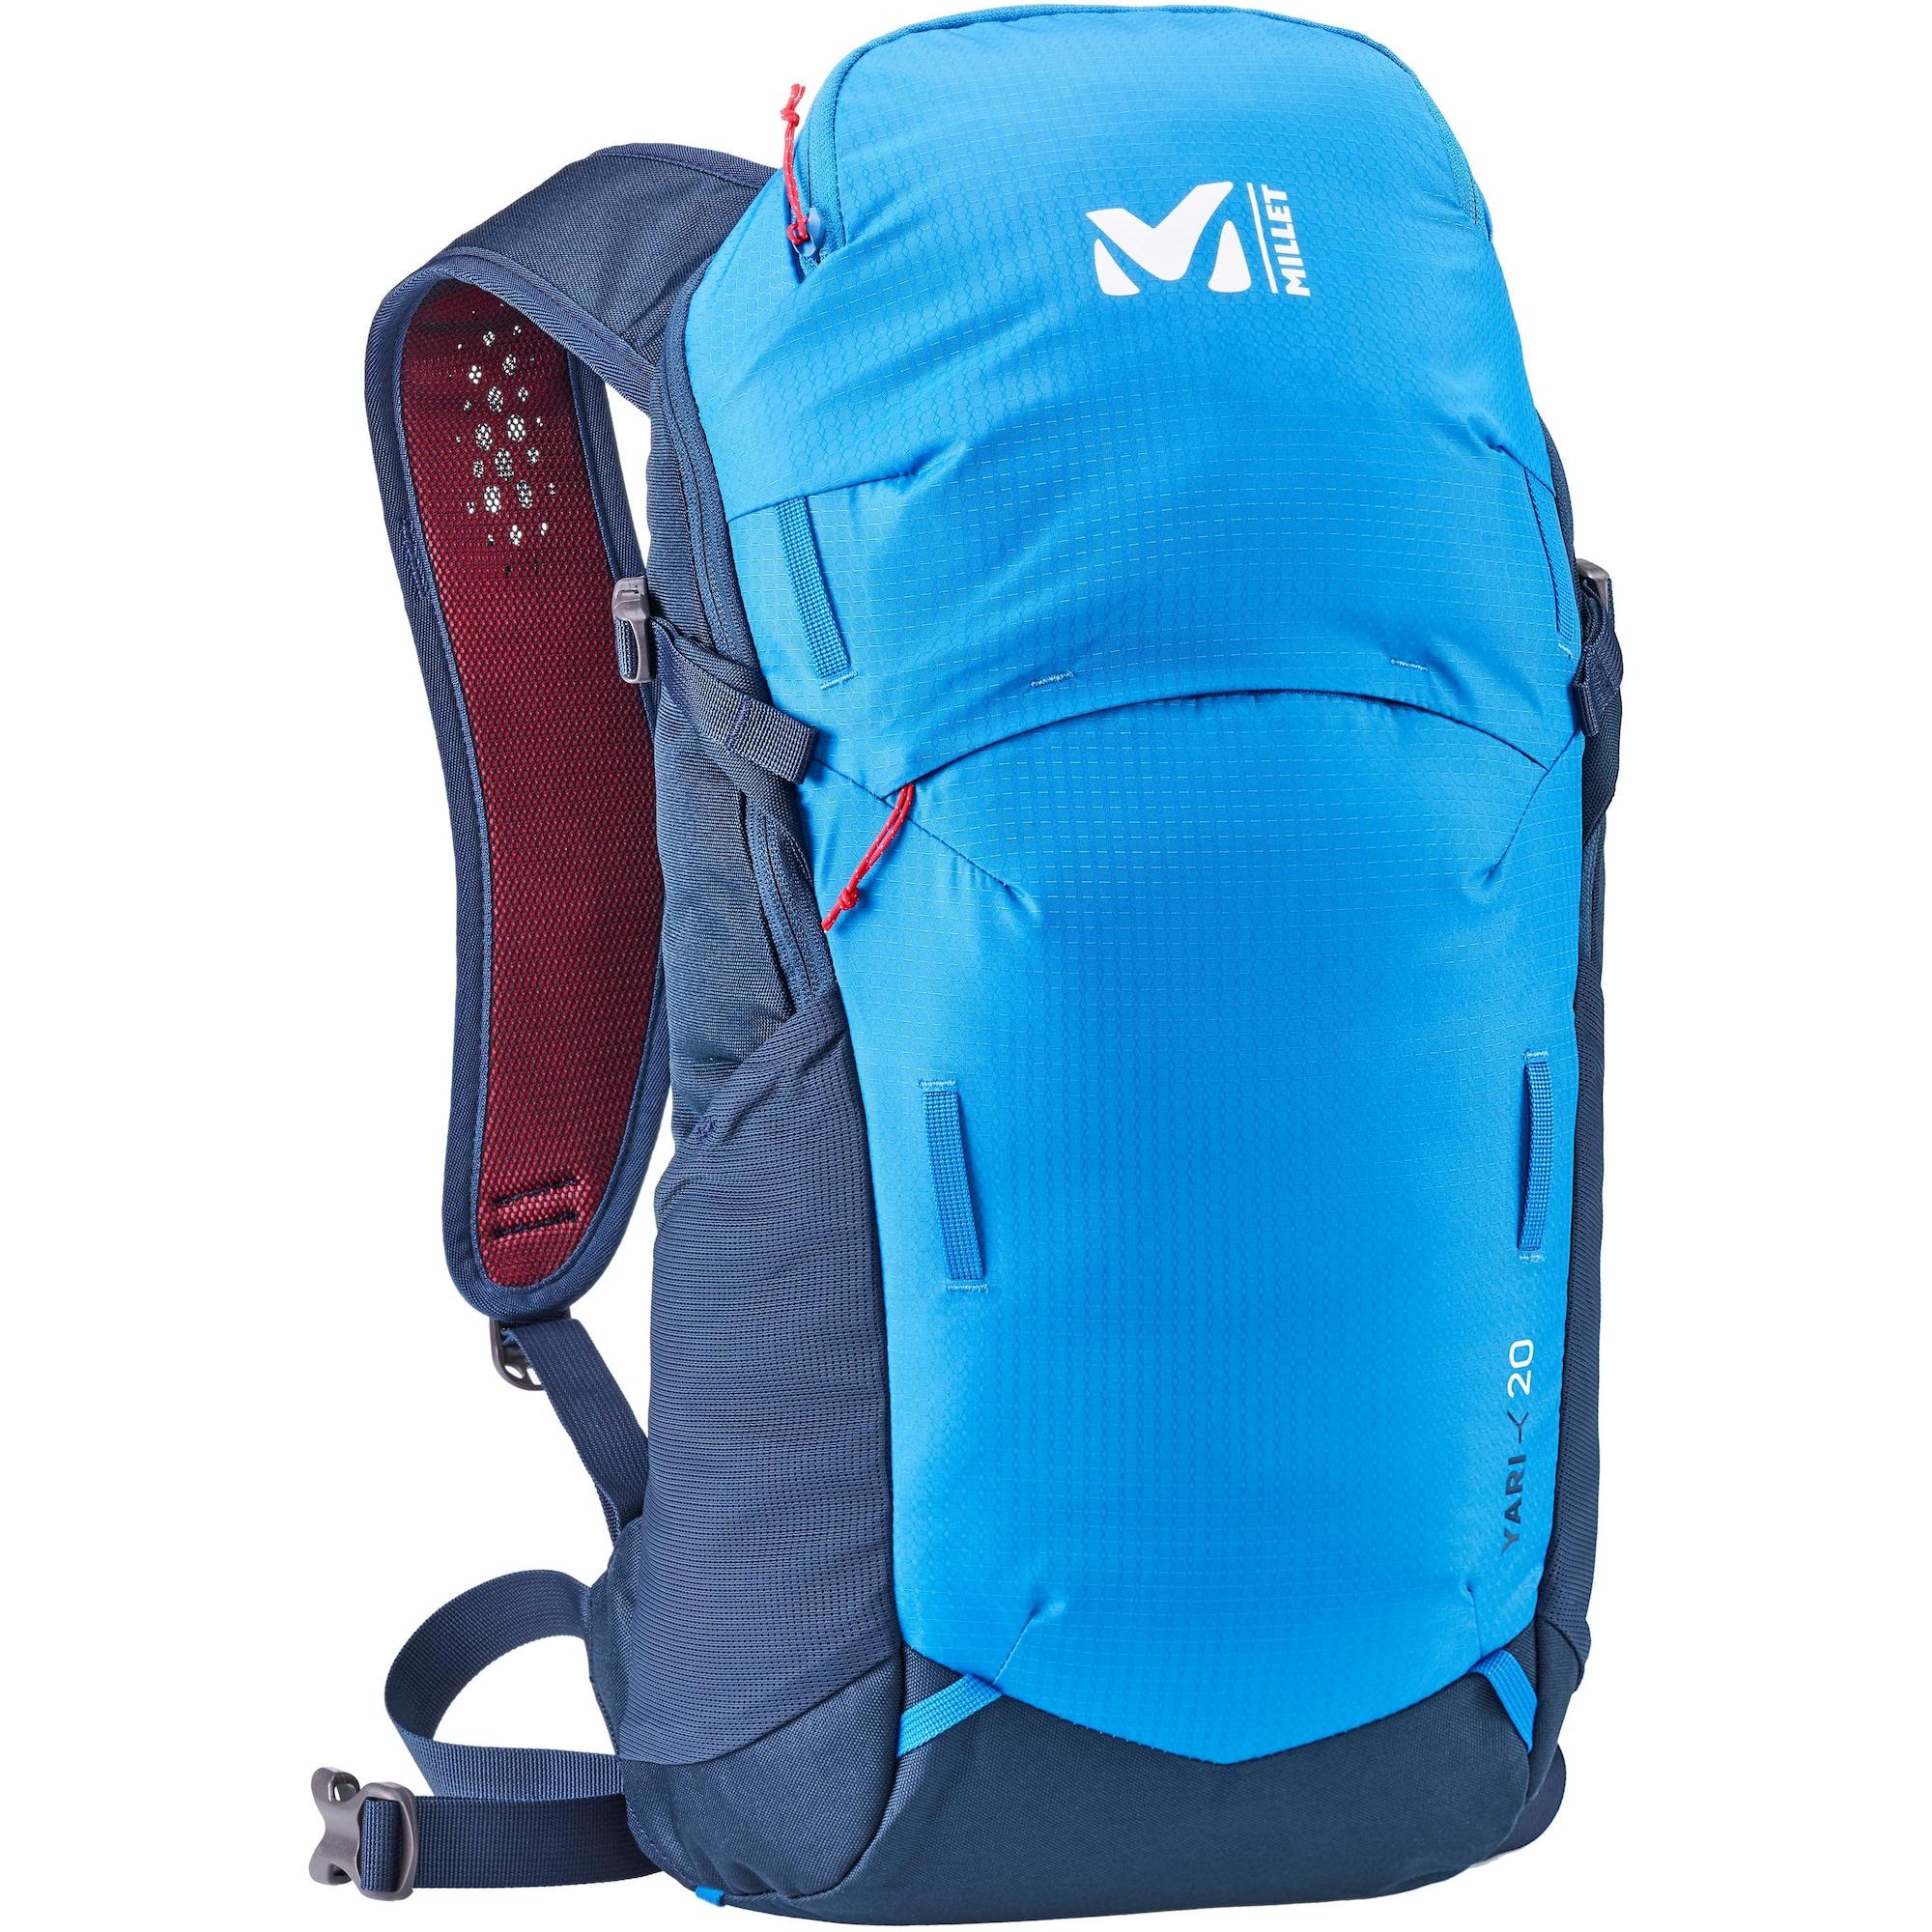 Daypack 'Yary 20' | Taschen > Rucksäcke > Tagesrucksäcke | Millet